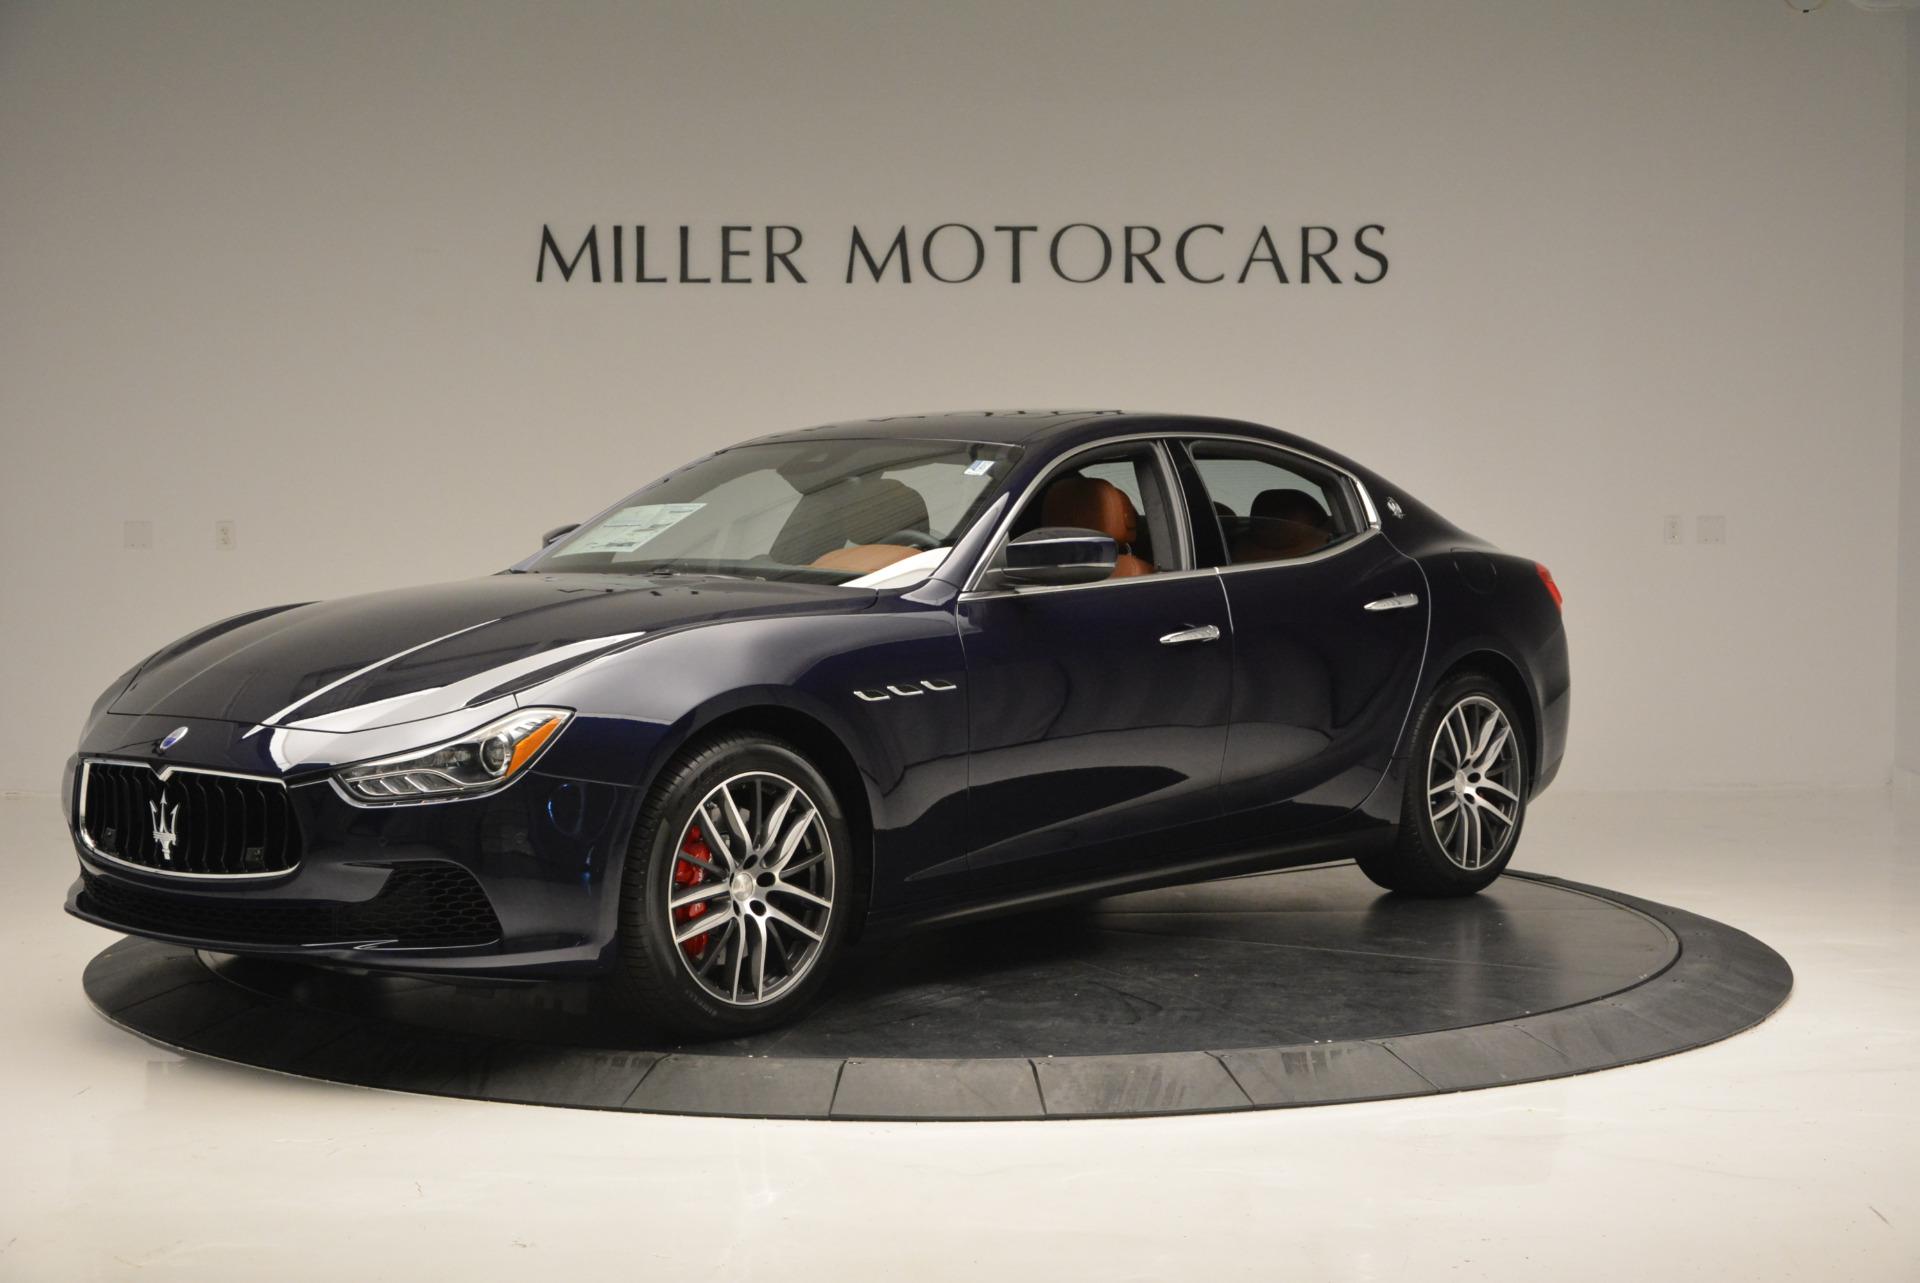 Used 2017 Maserati Ghibli S Q4 - EX Loaner For Sale In Greenwich, CT. Alfa Romeo of Greenwich, M1656 567_p2